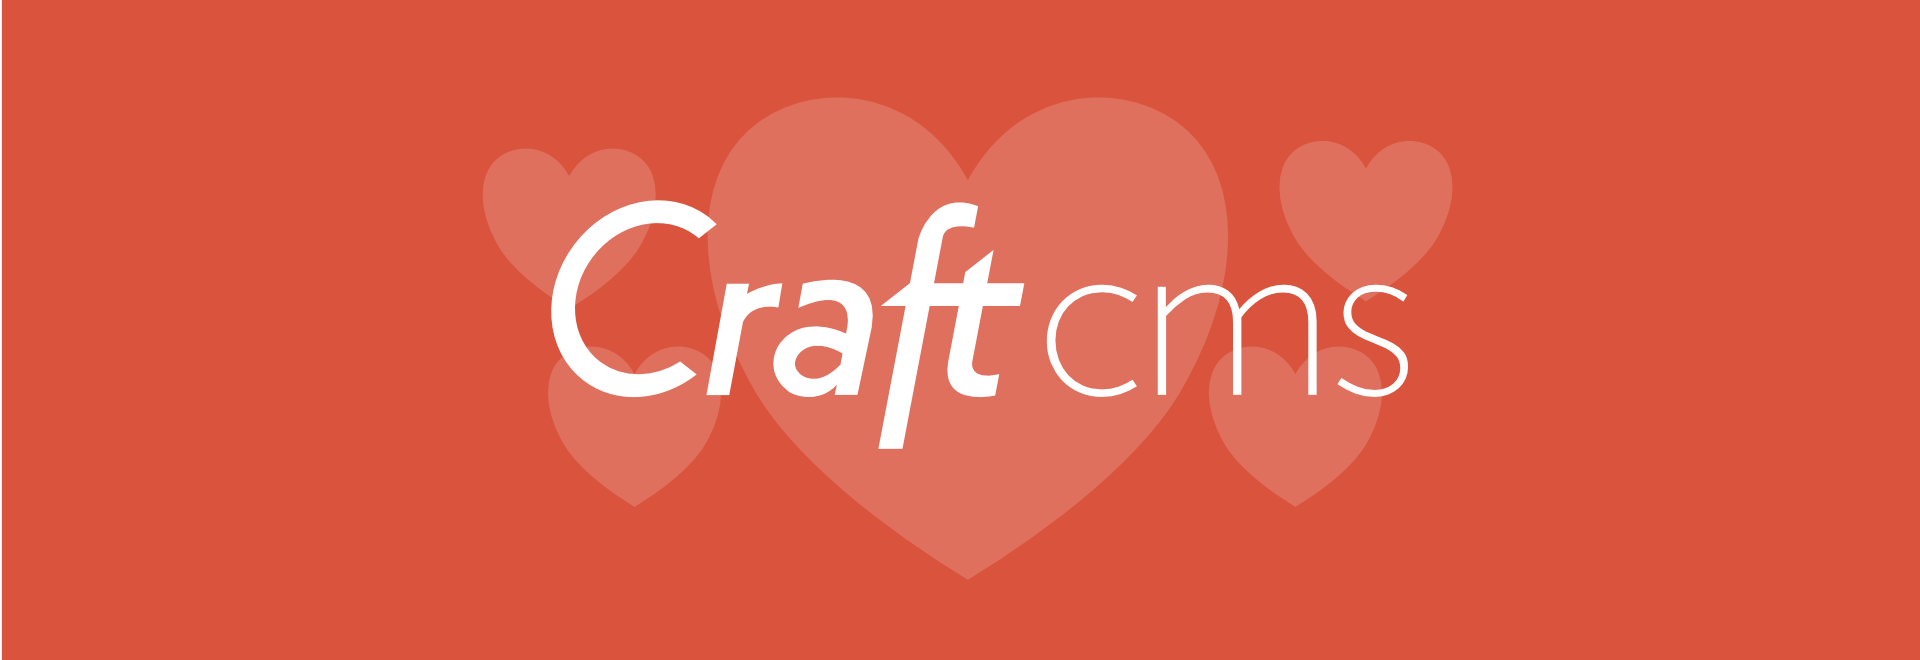 Craftcms Love Hero Image